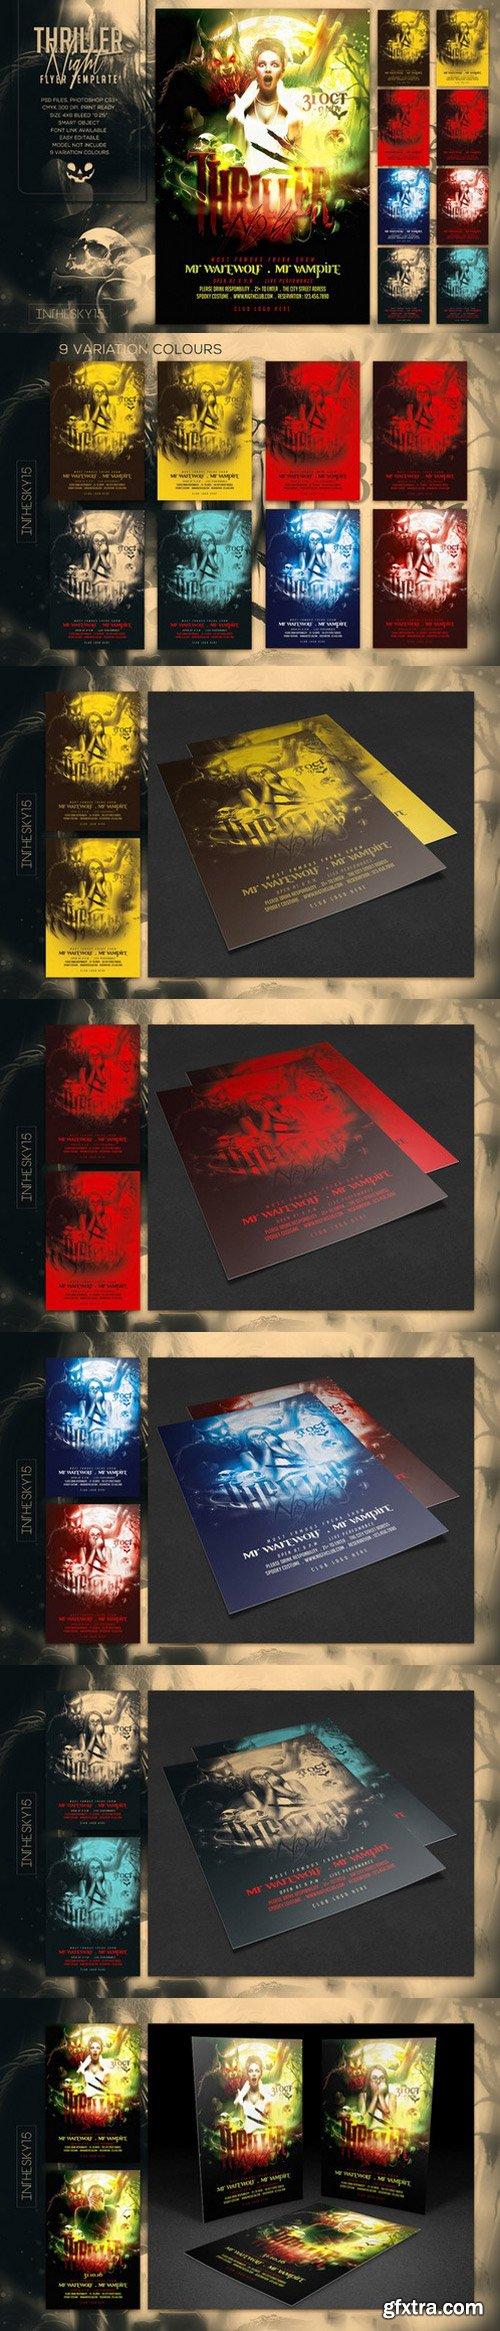 CM - Thriller Night Flyer Template 972723